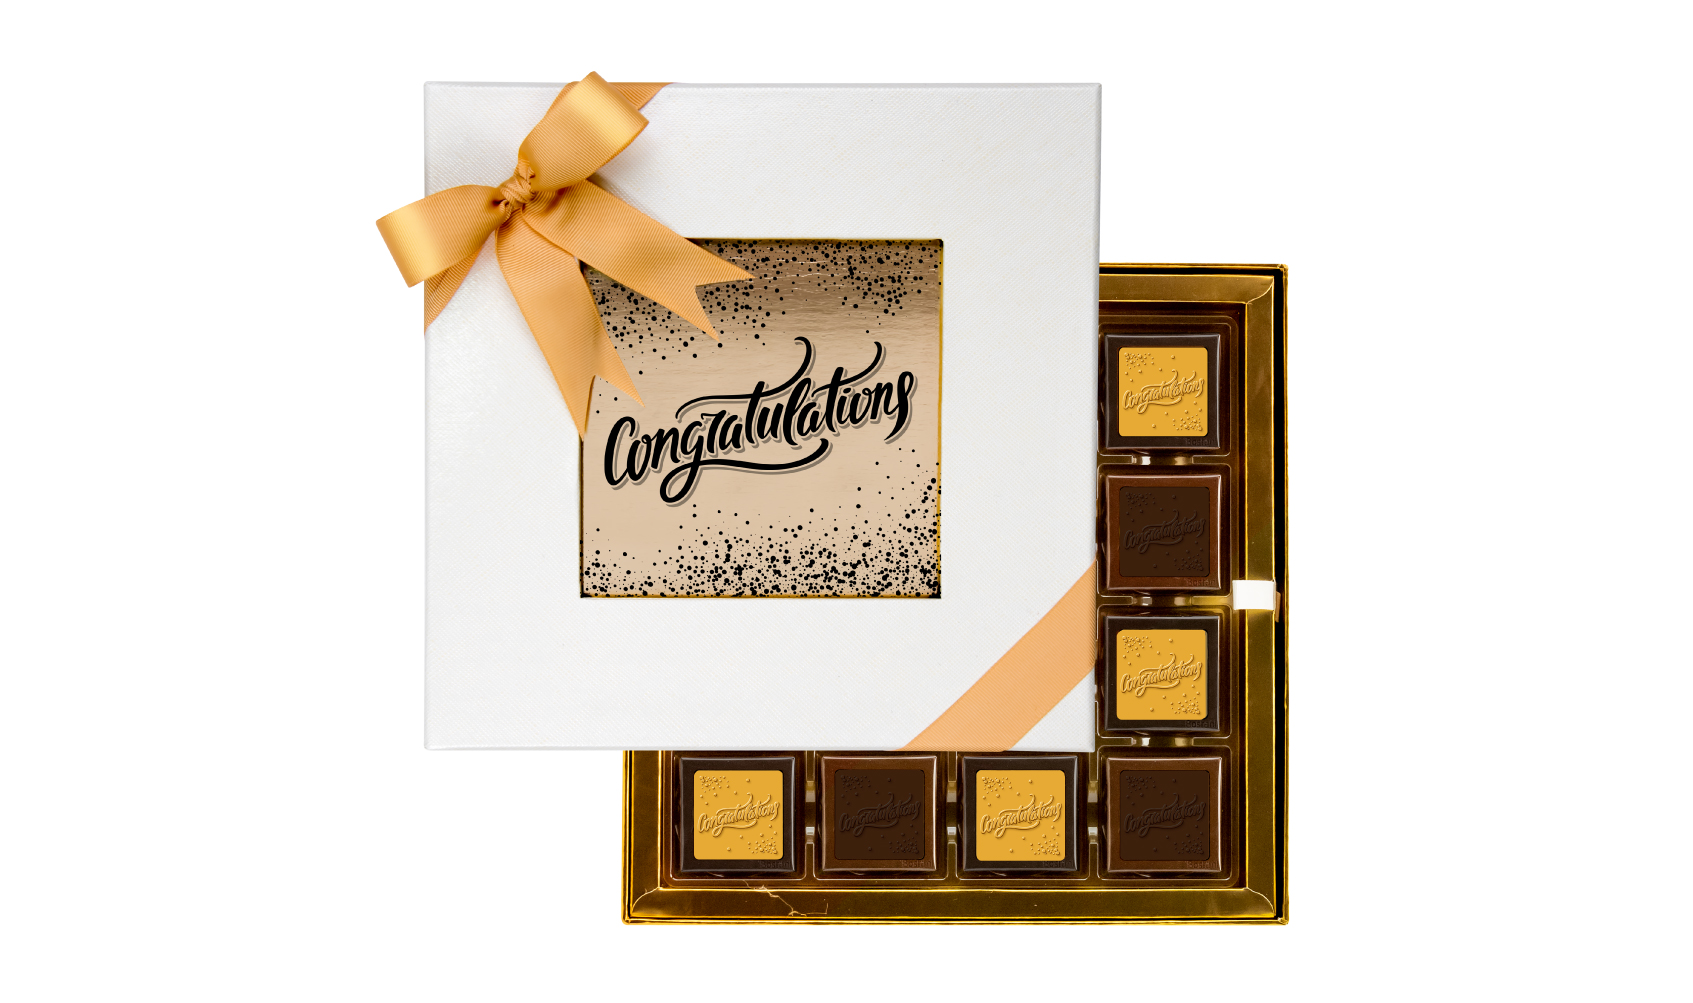 Congratulation 32 Chocolate PCS Box